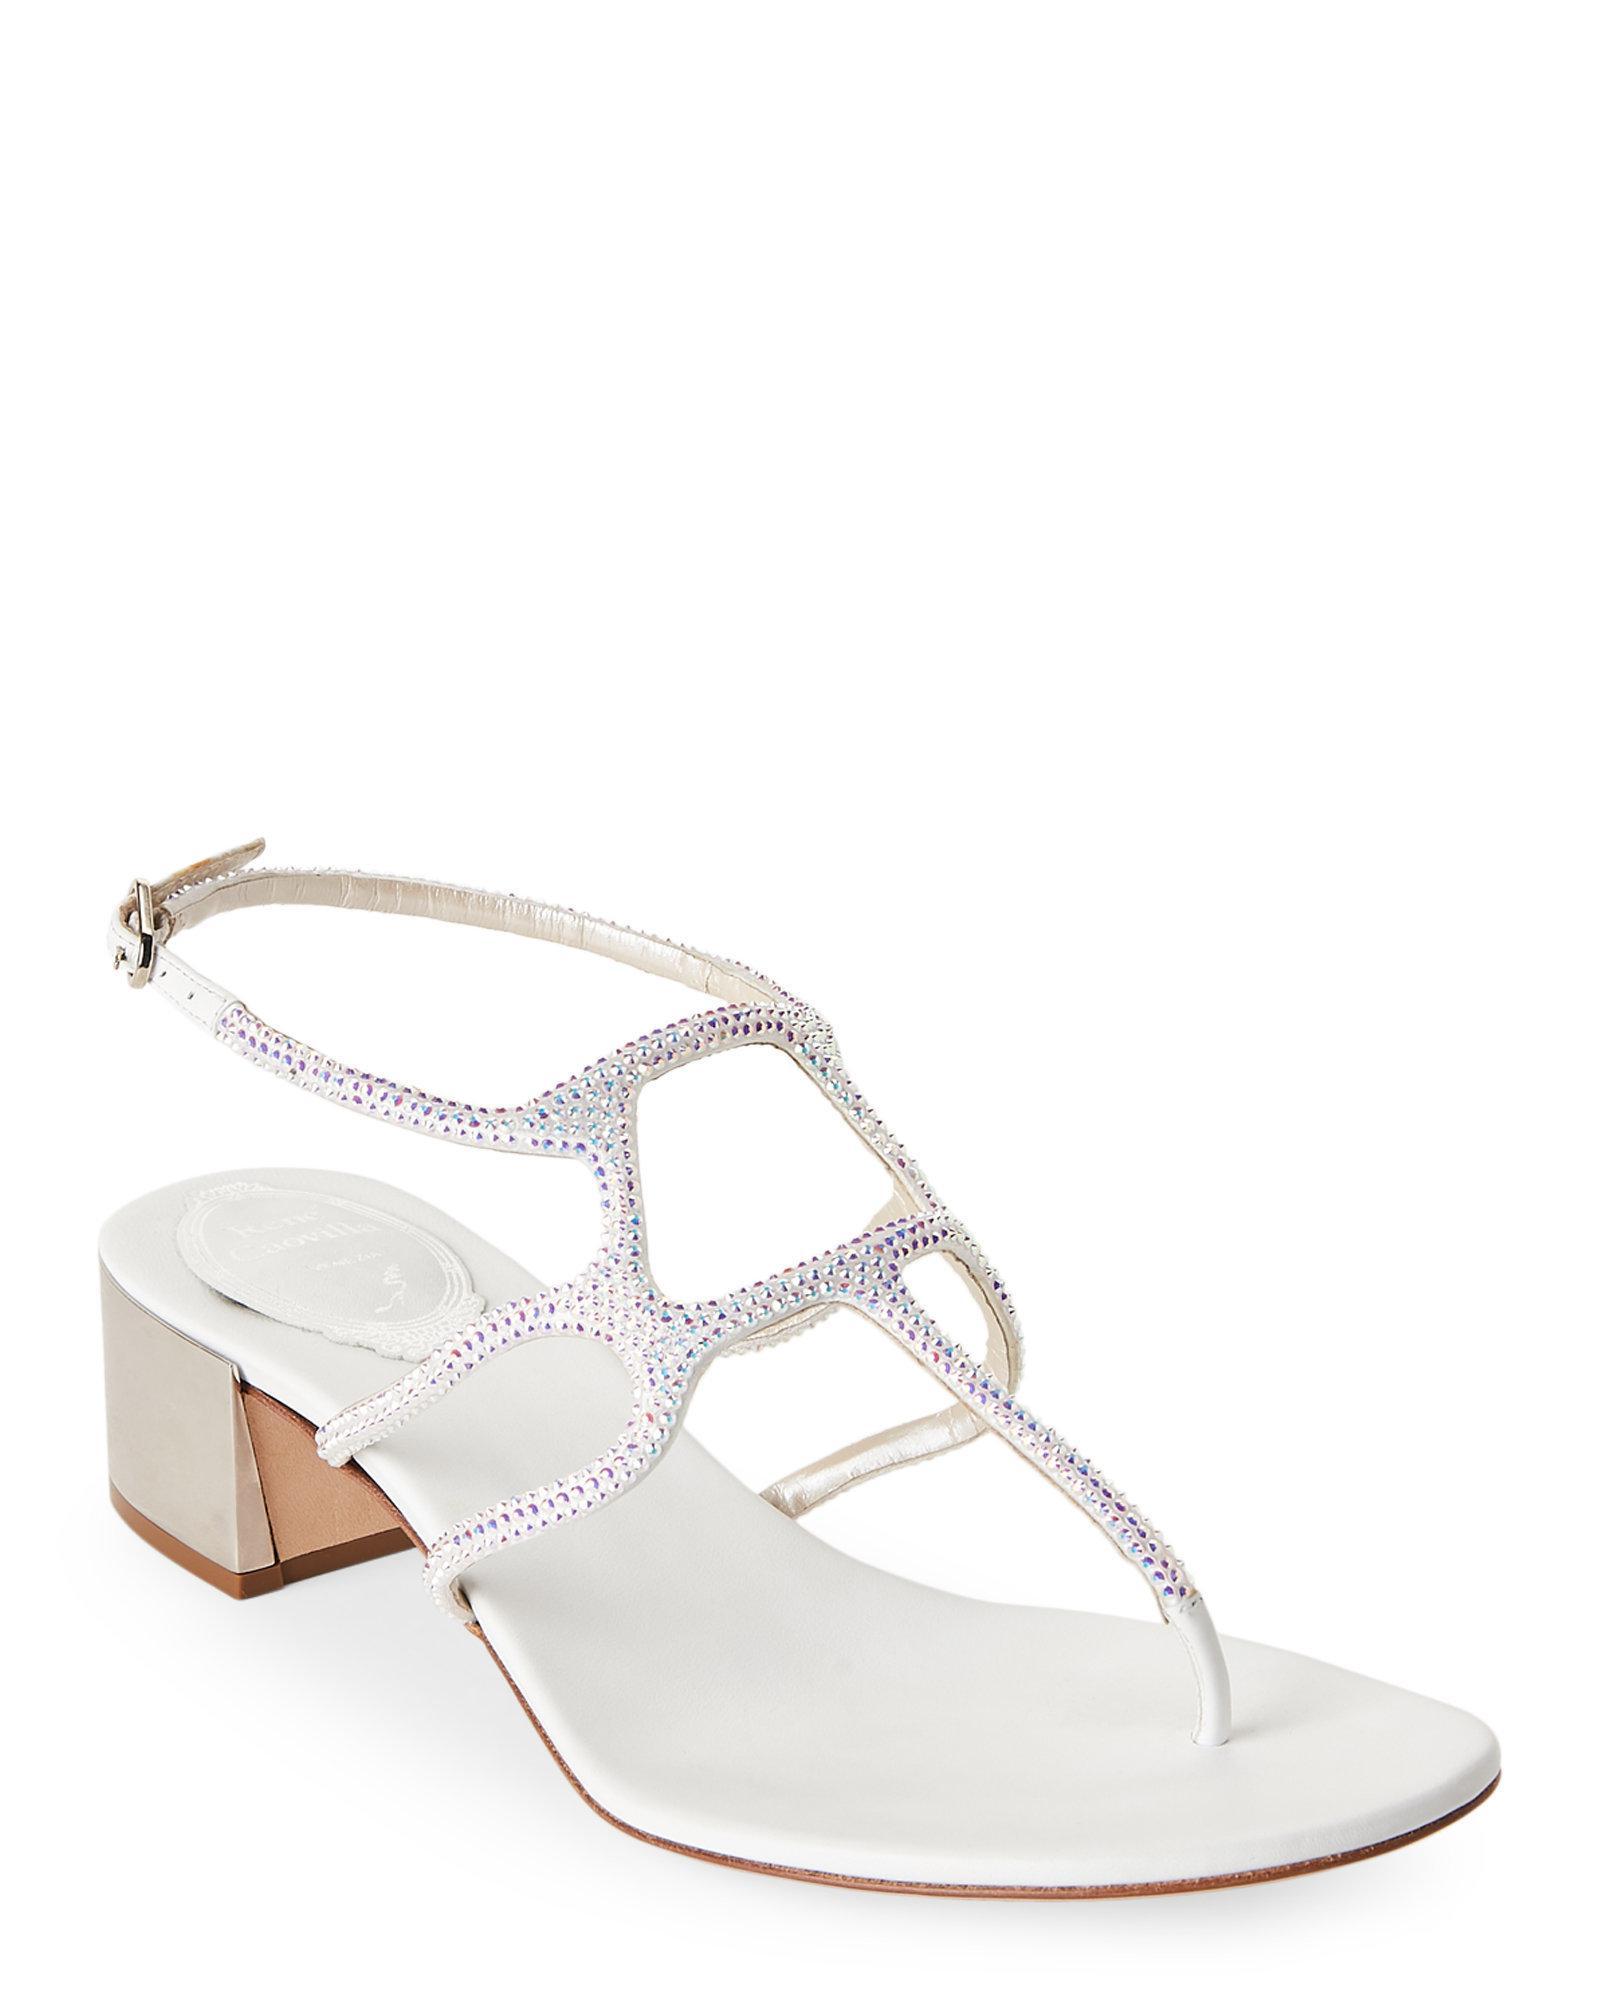 ea59699ec64 Lyst - Rene Caovilla White Crystal-embellished Strappy Block Heel ...